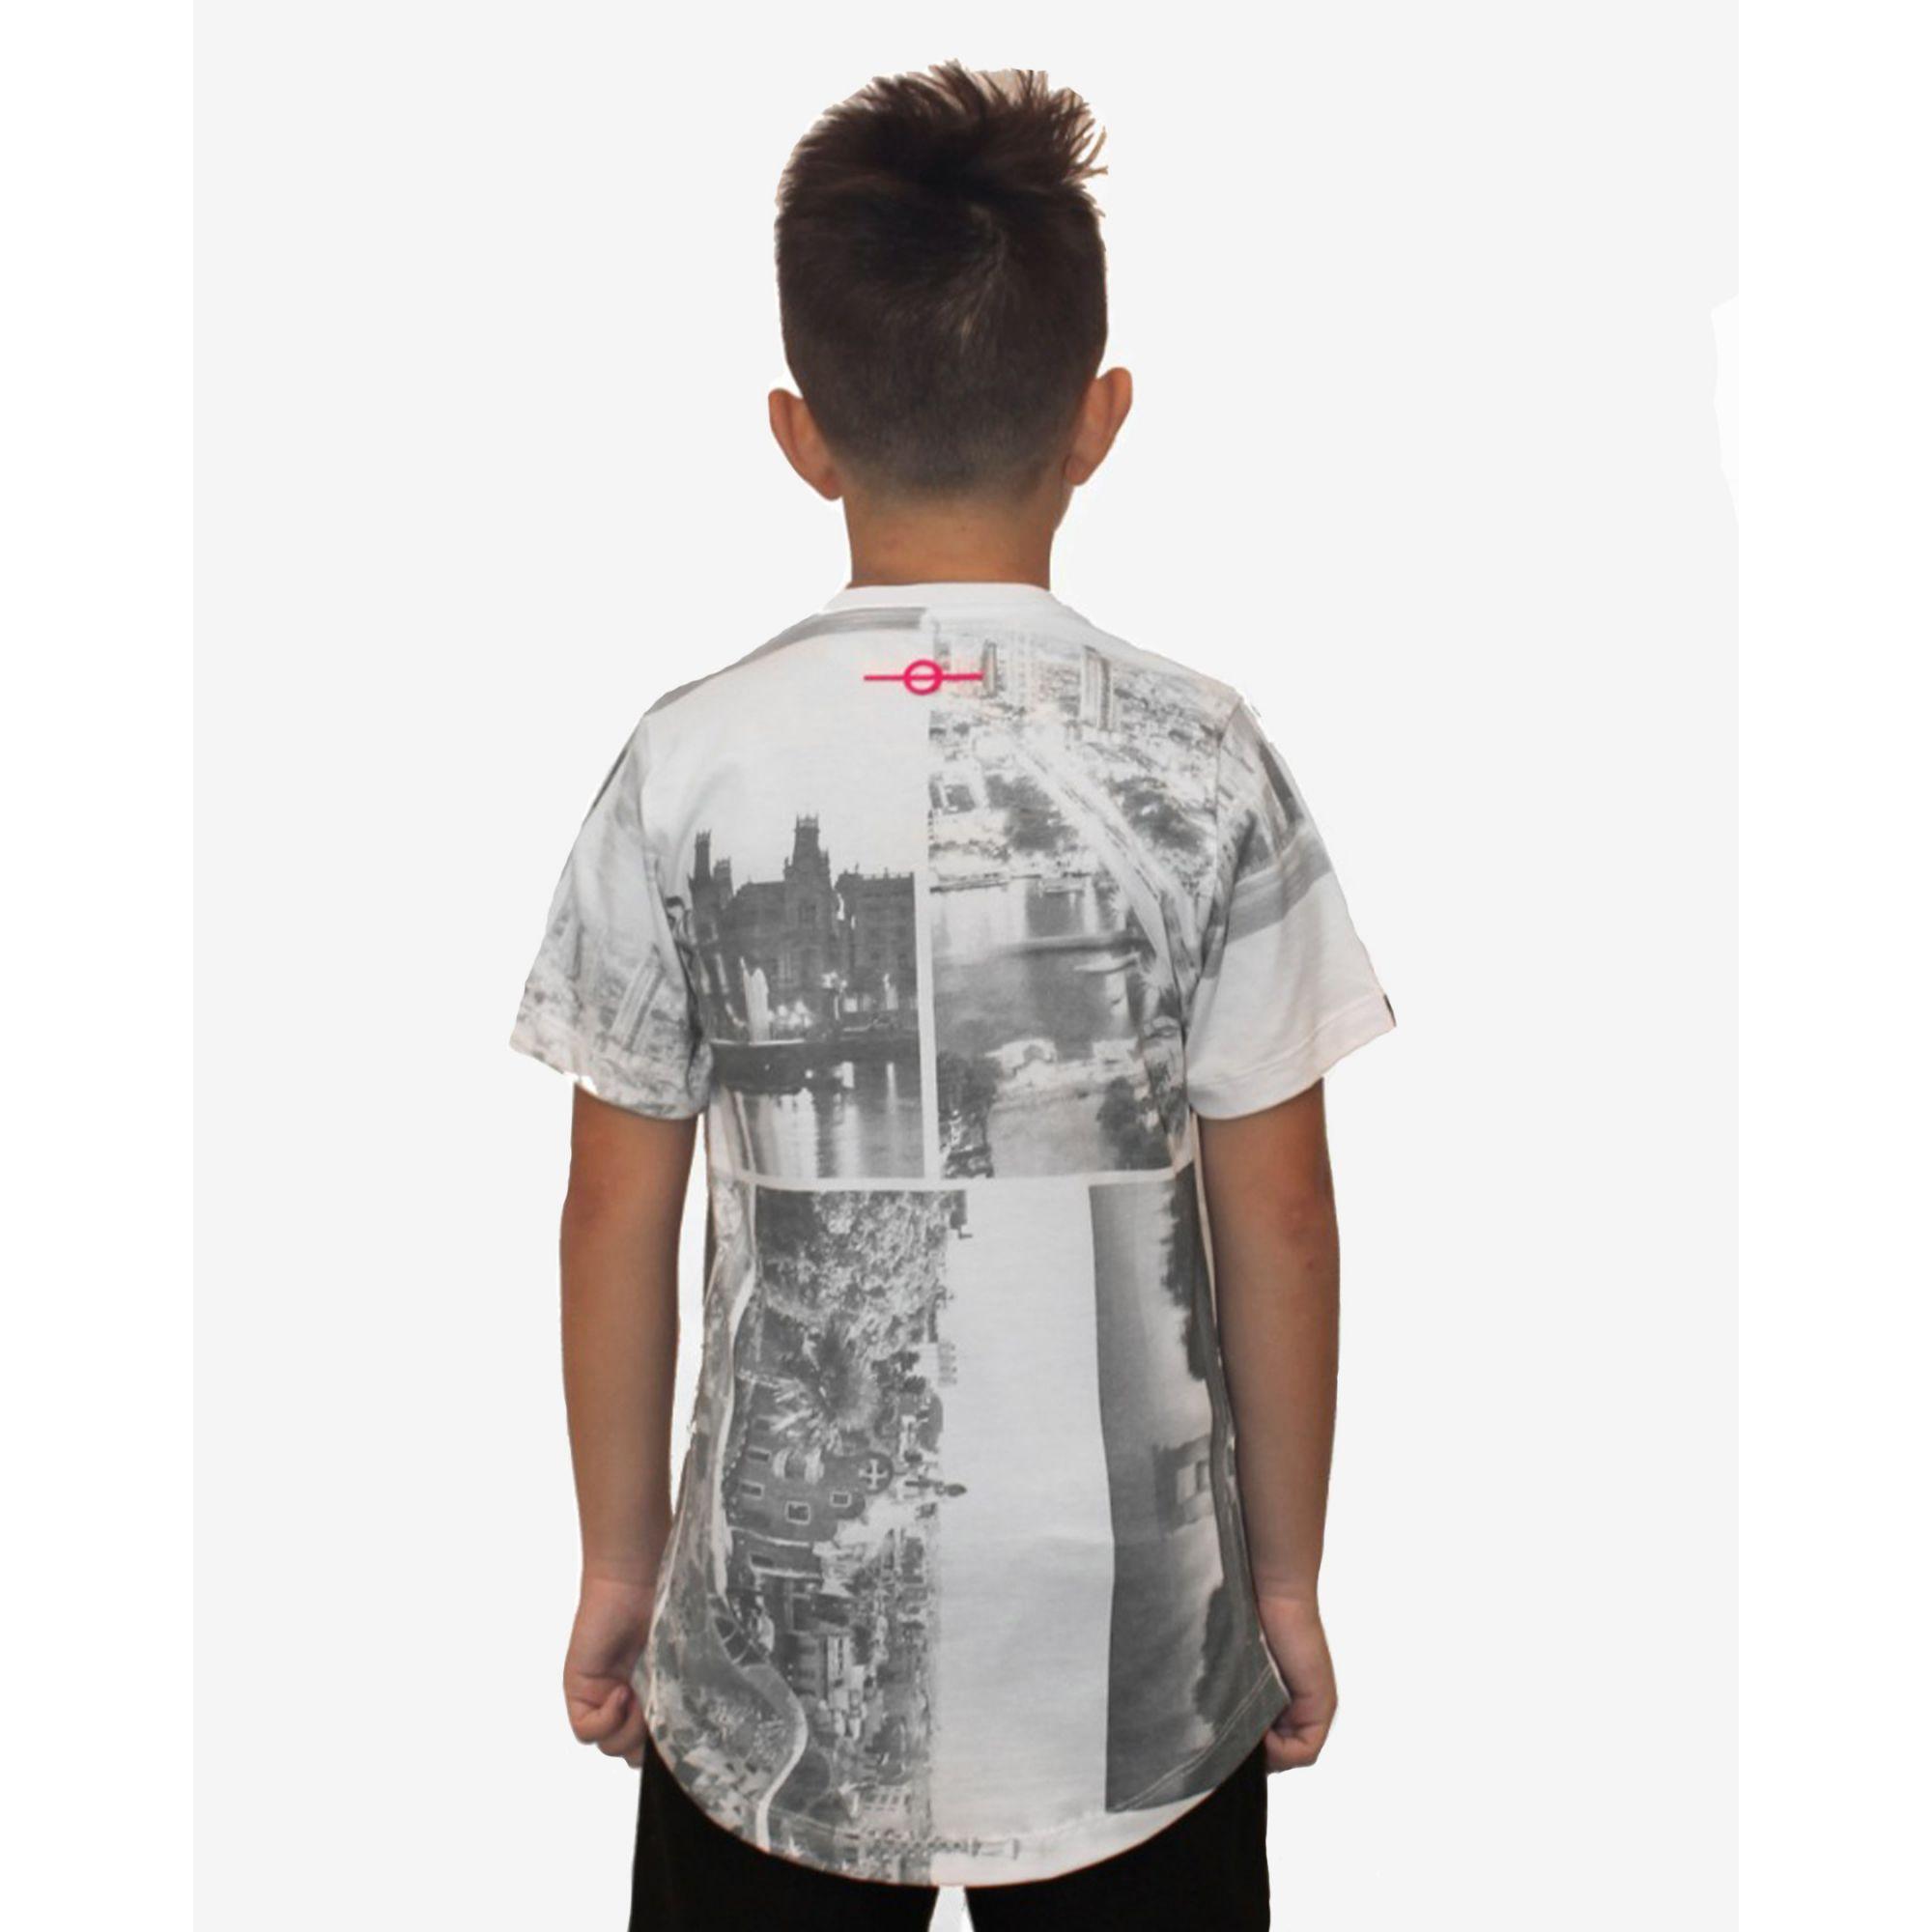 Camiseta Buh Kids Full City Heróis